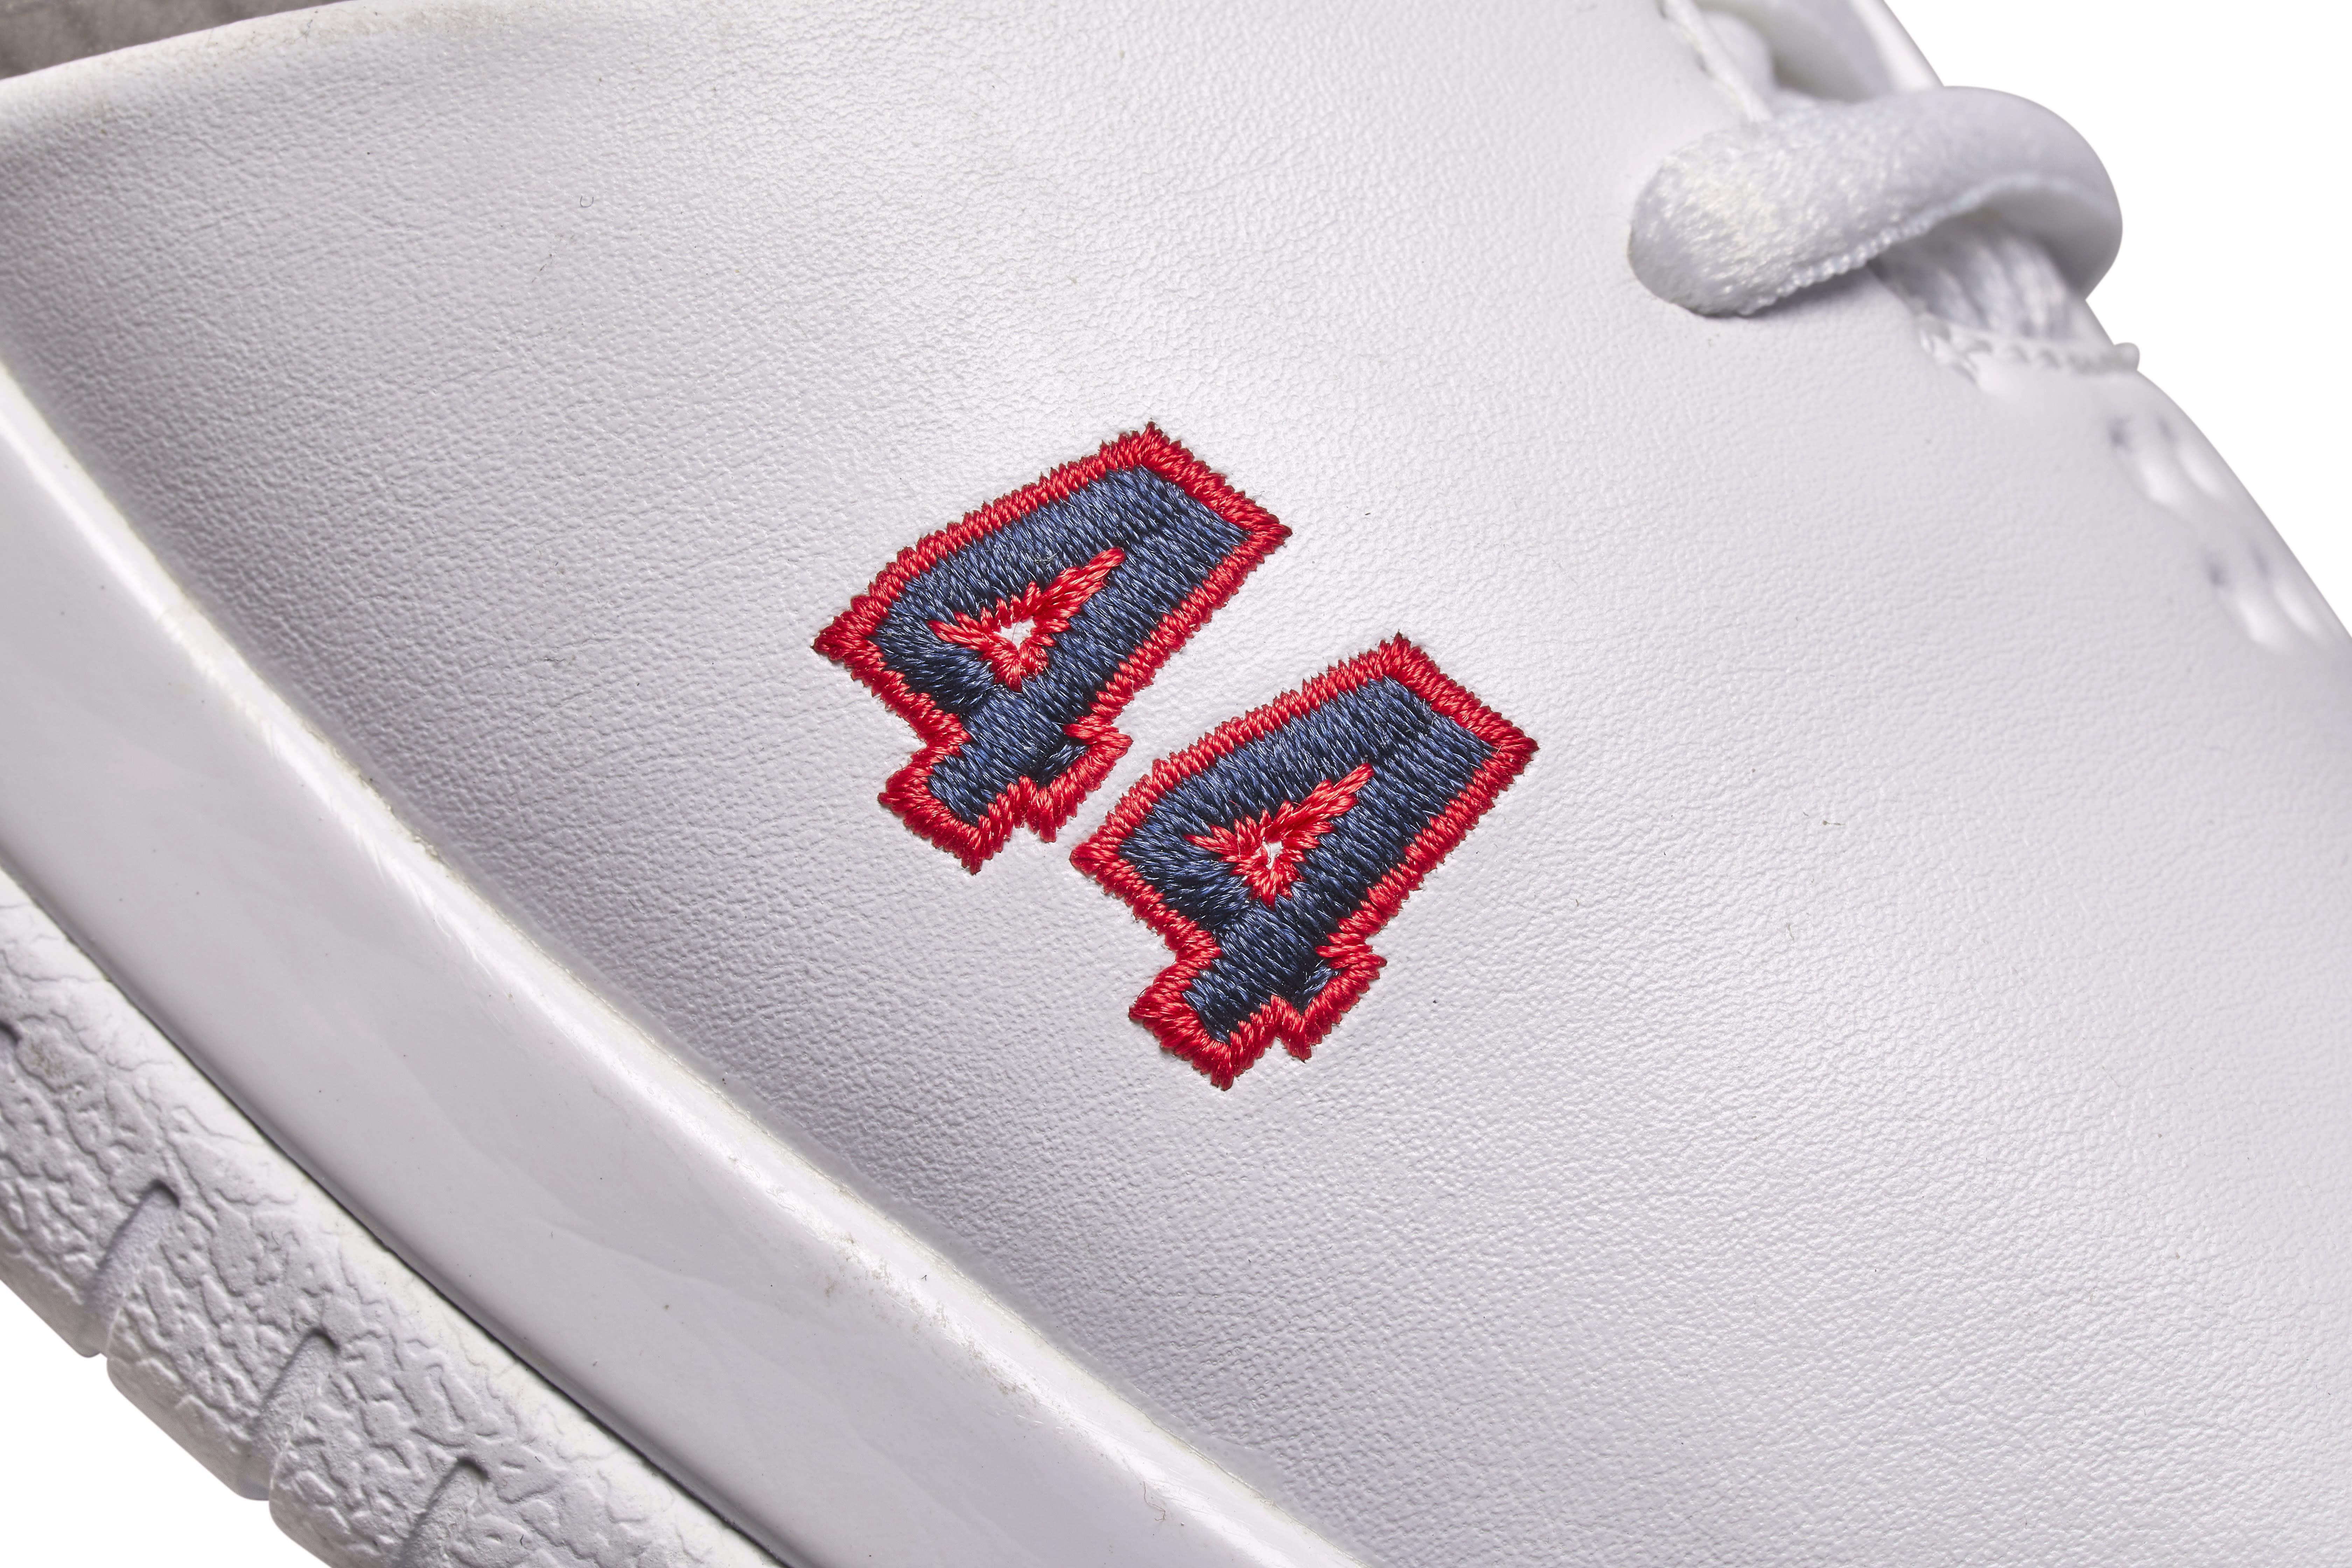 Nike Hyperdunk 'Barack Obama' PE Toe